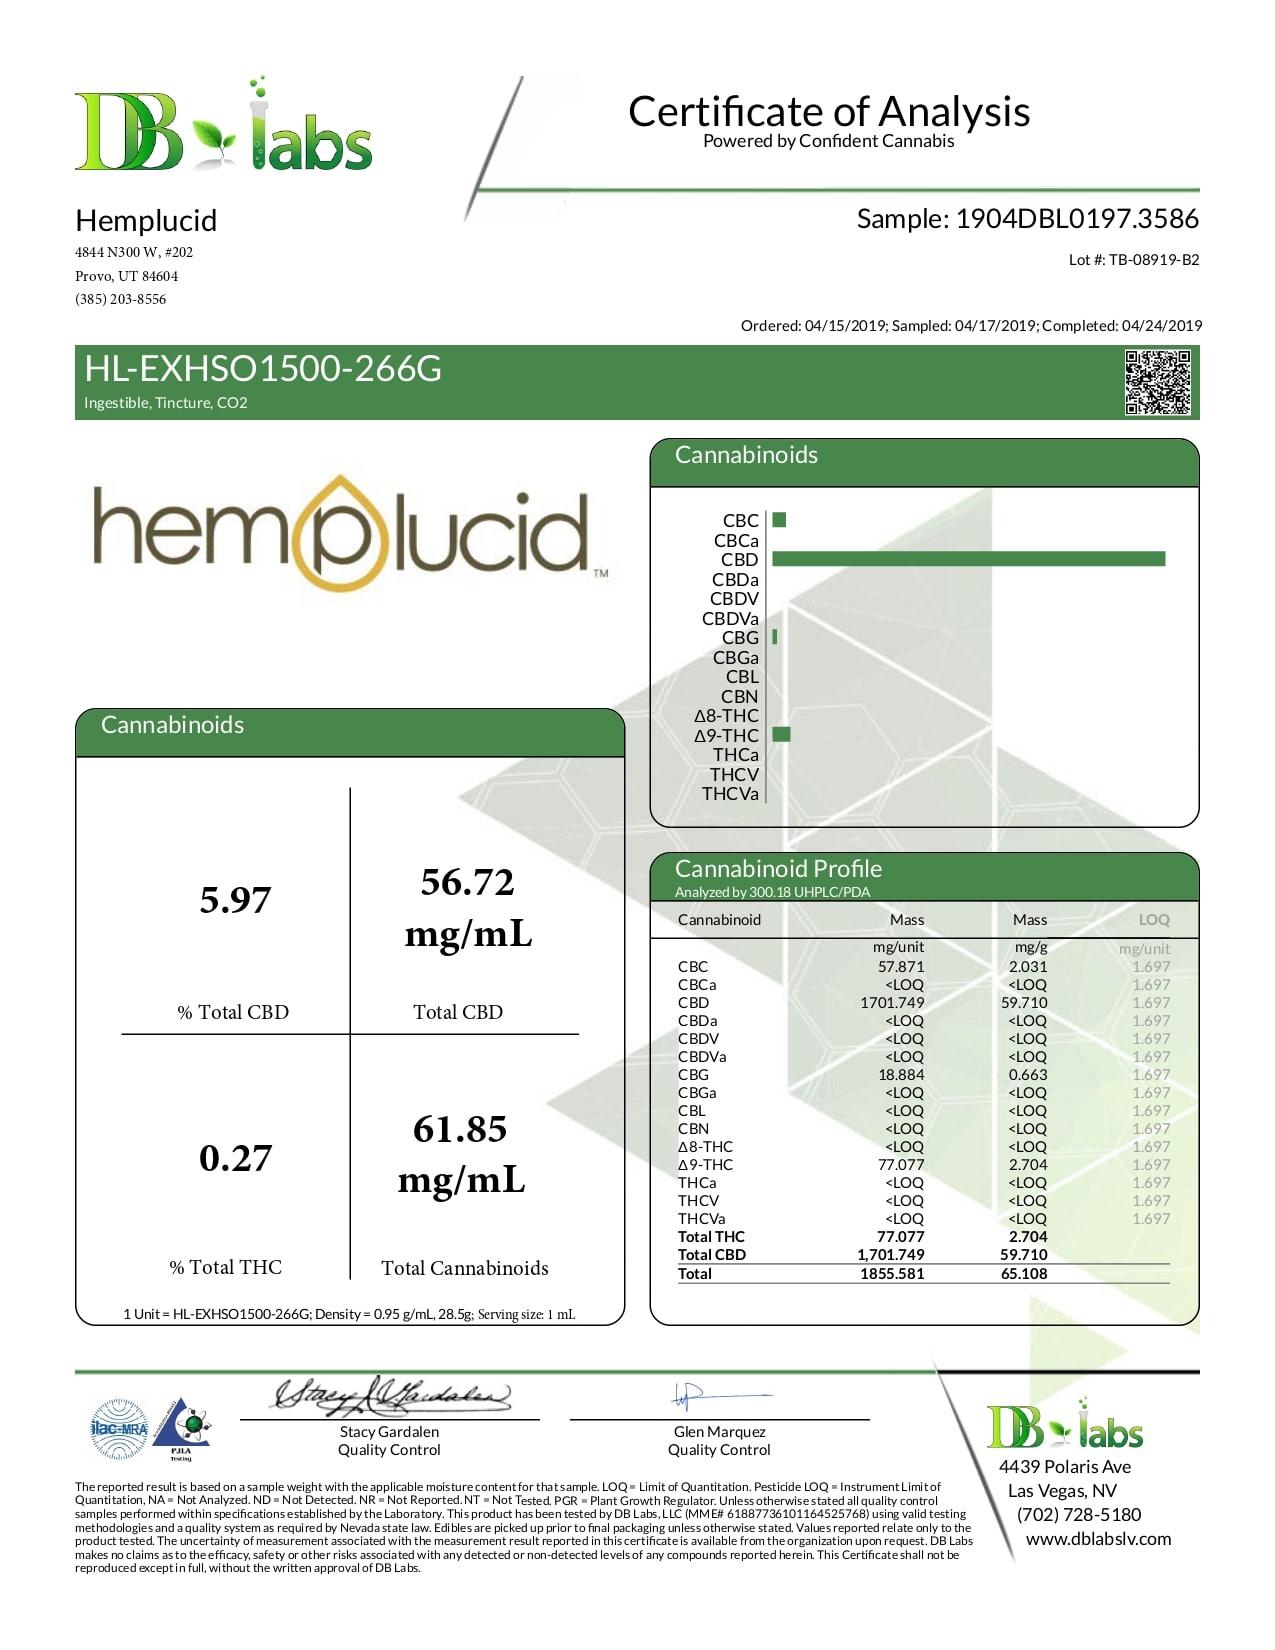 Hemplucid Full Spectrum CBD Hemp Seed Oil 1500mg Lab Report